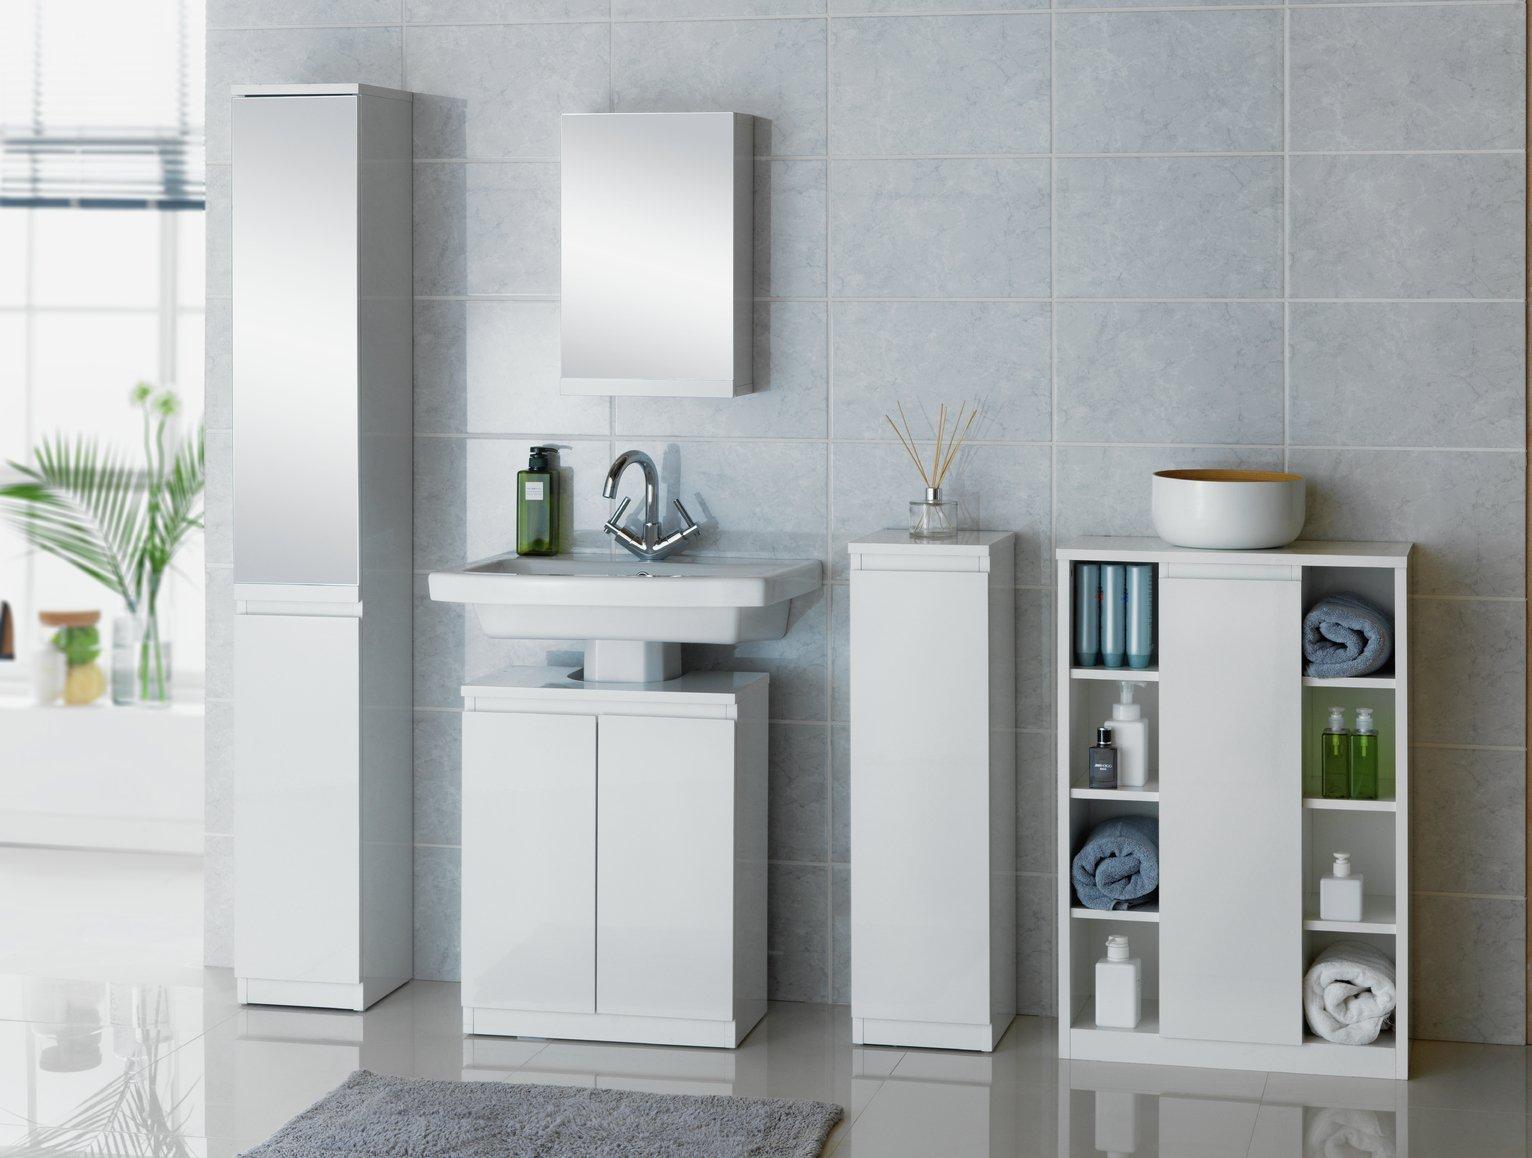 Bathroom Floor Cabinet buy hygena gloss floor cabinet storage - white at argos.co.uk